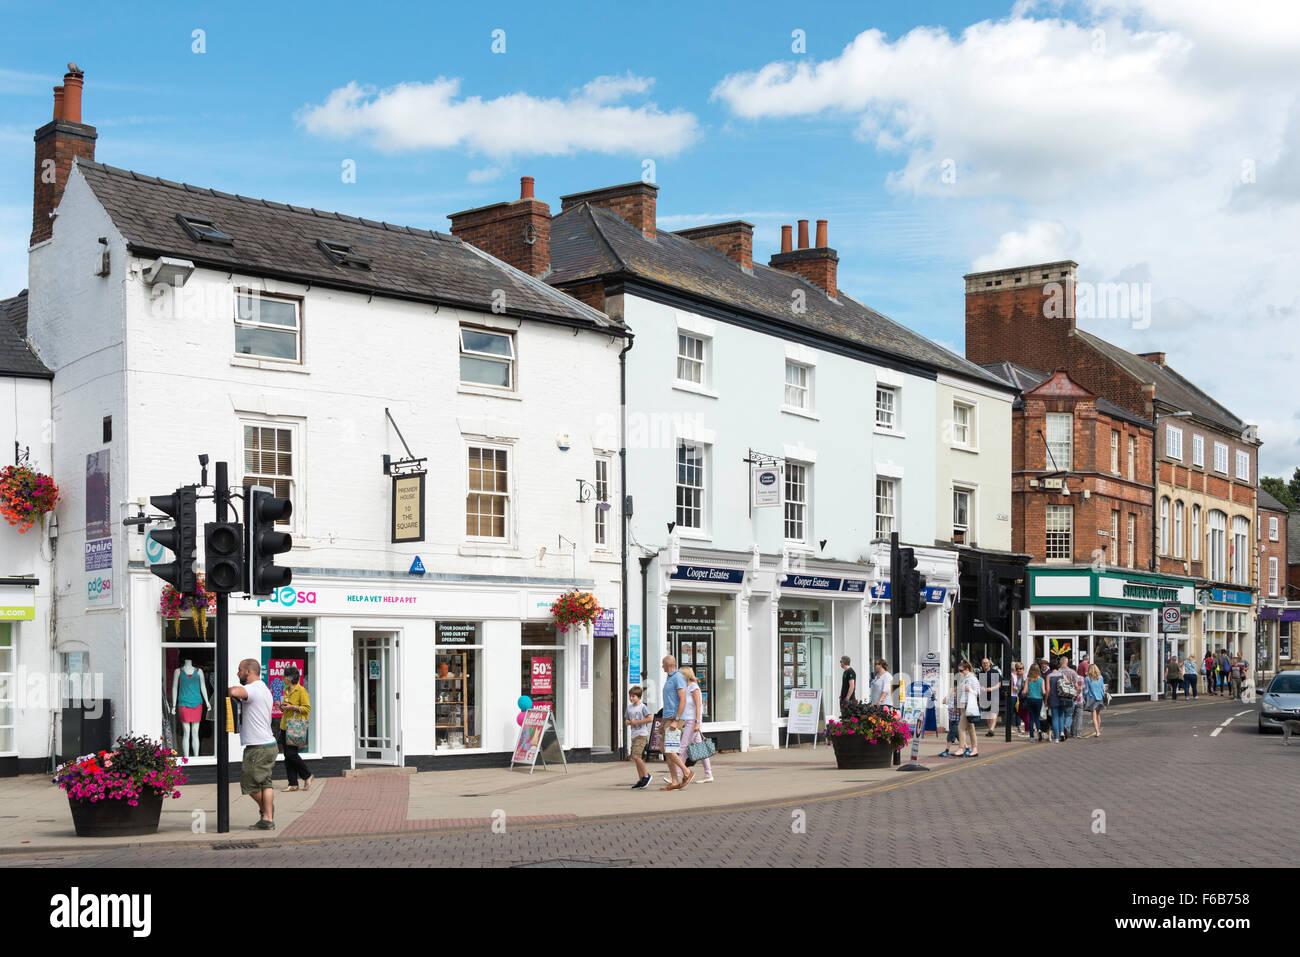 Shops on The Square, Market Harborough, Leicestershire, England, United Kingdom - Stock Image